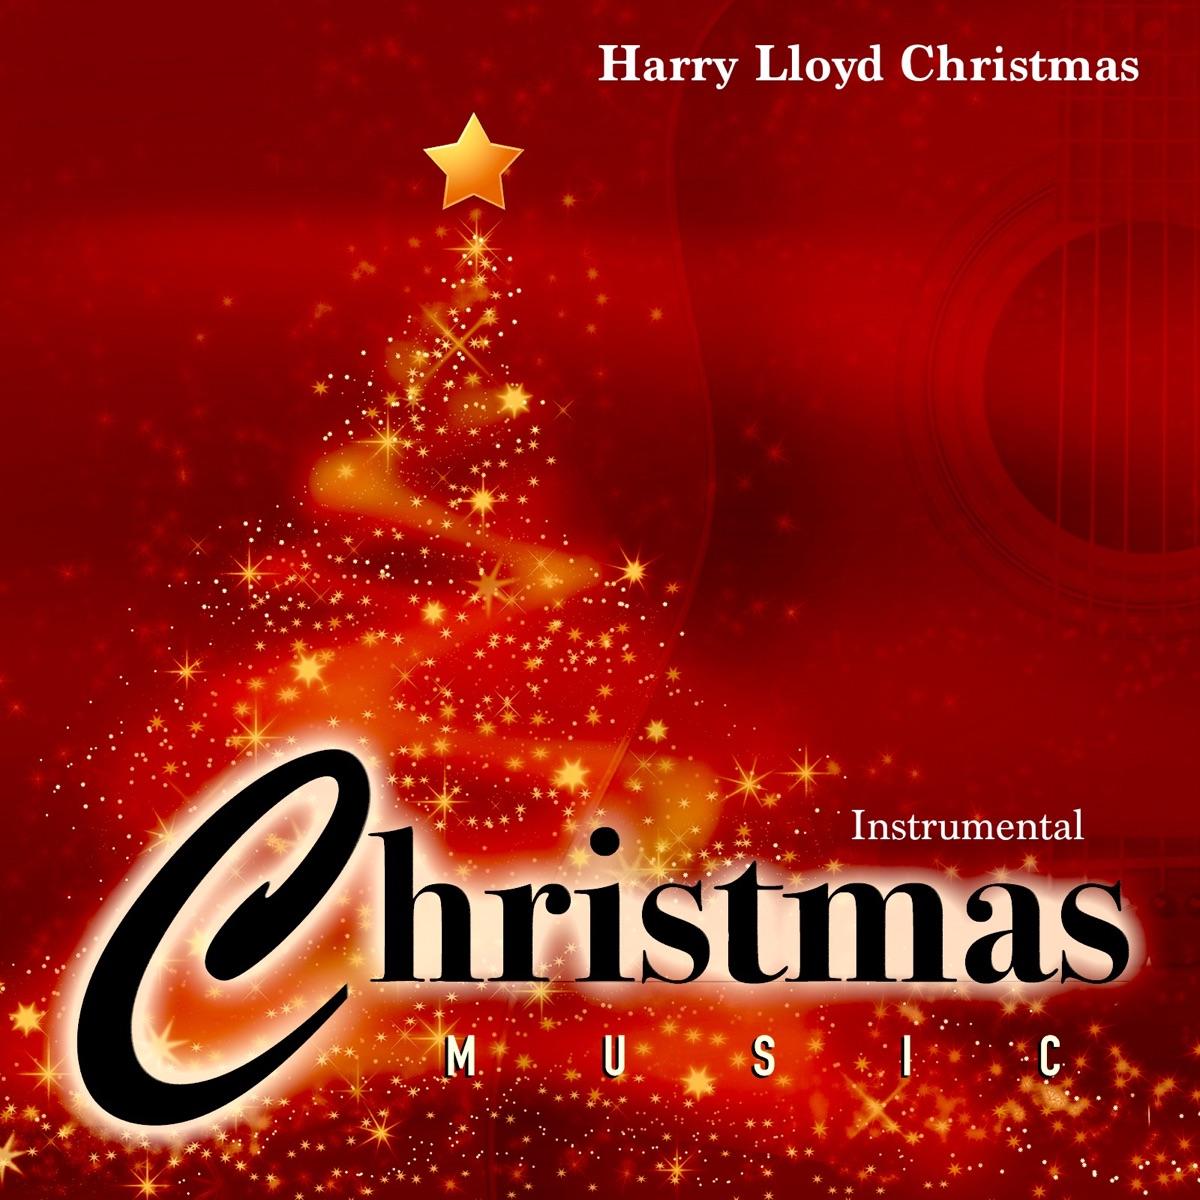 Album Cover by Harry Lloyd Christmas